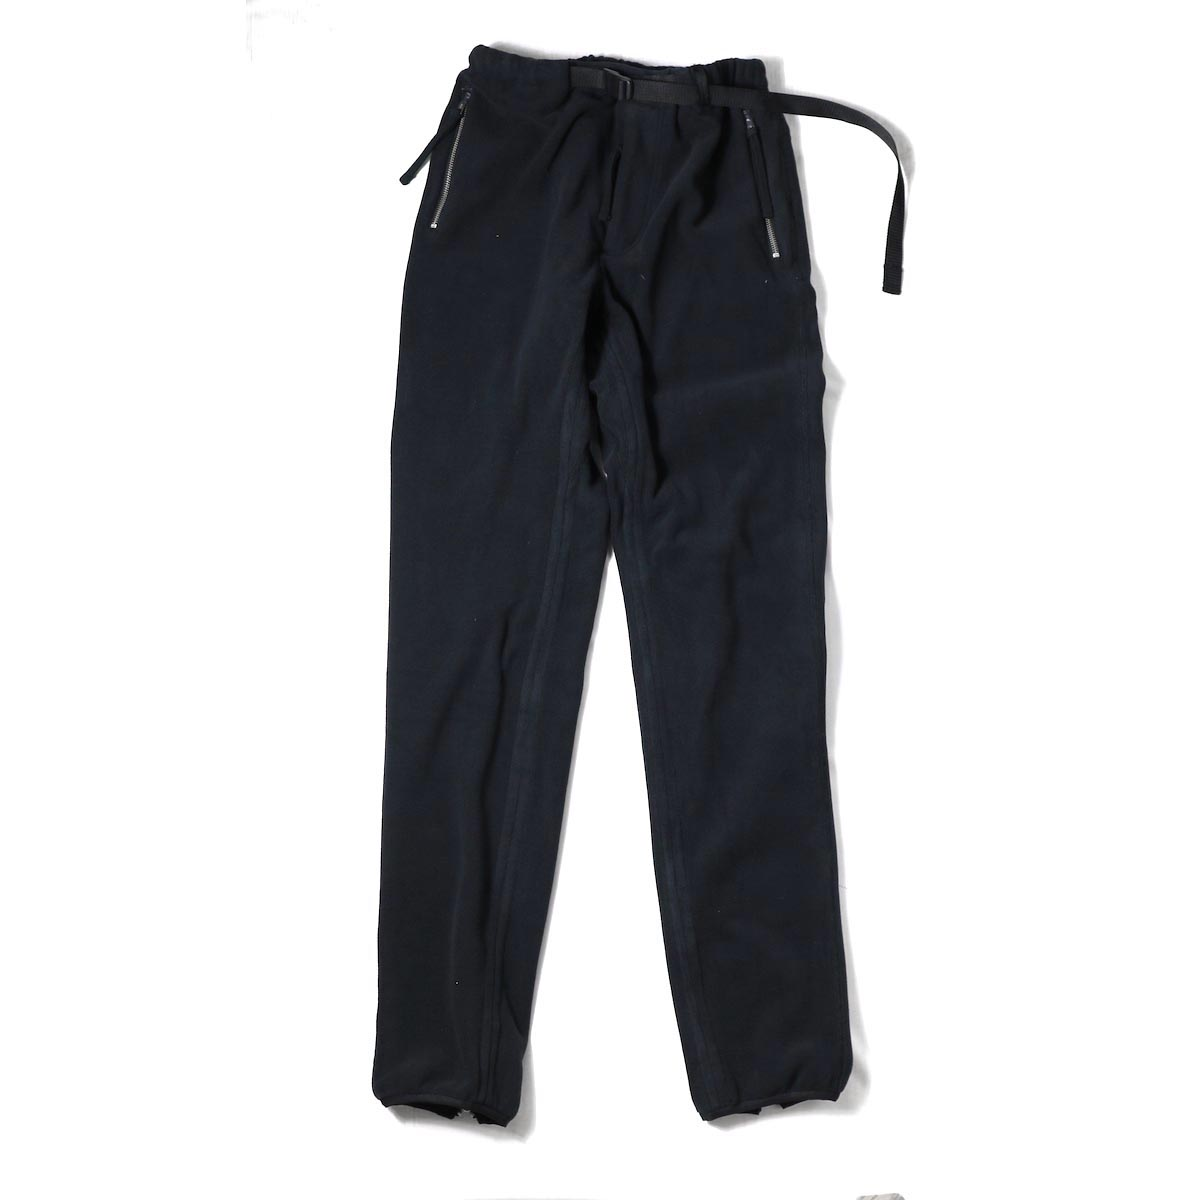 The Soloist / swp.0004AW18 regulator pants.